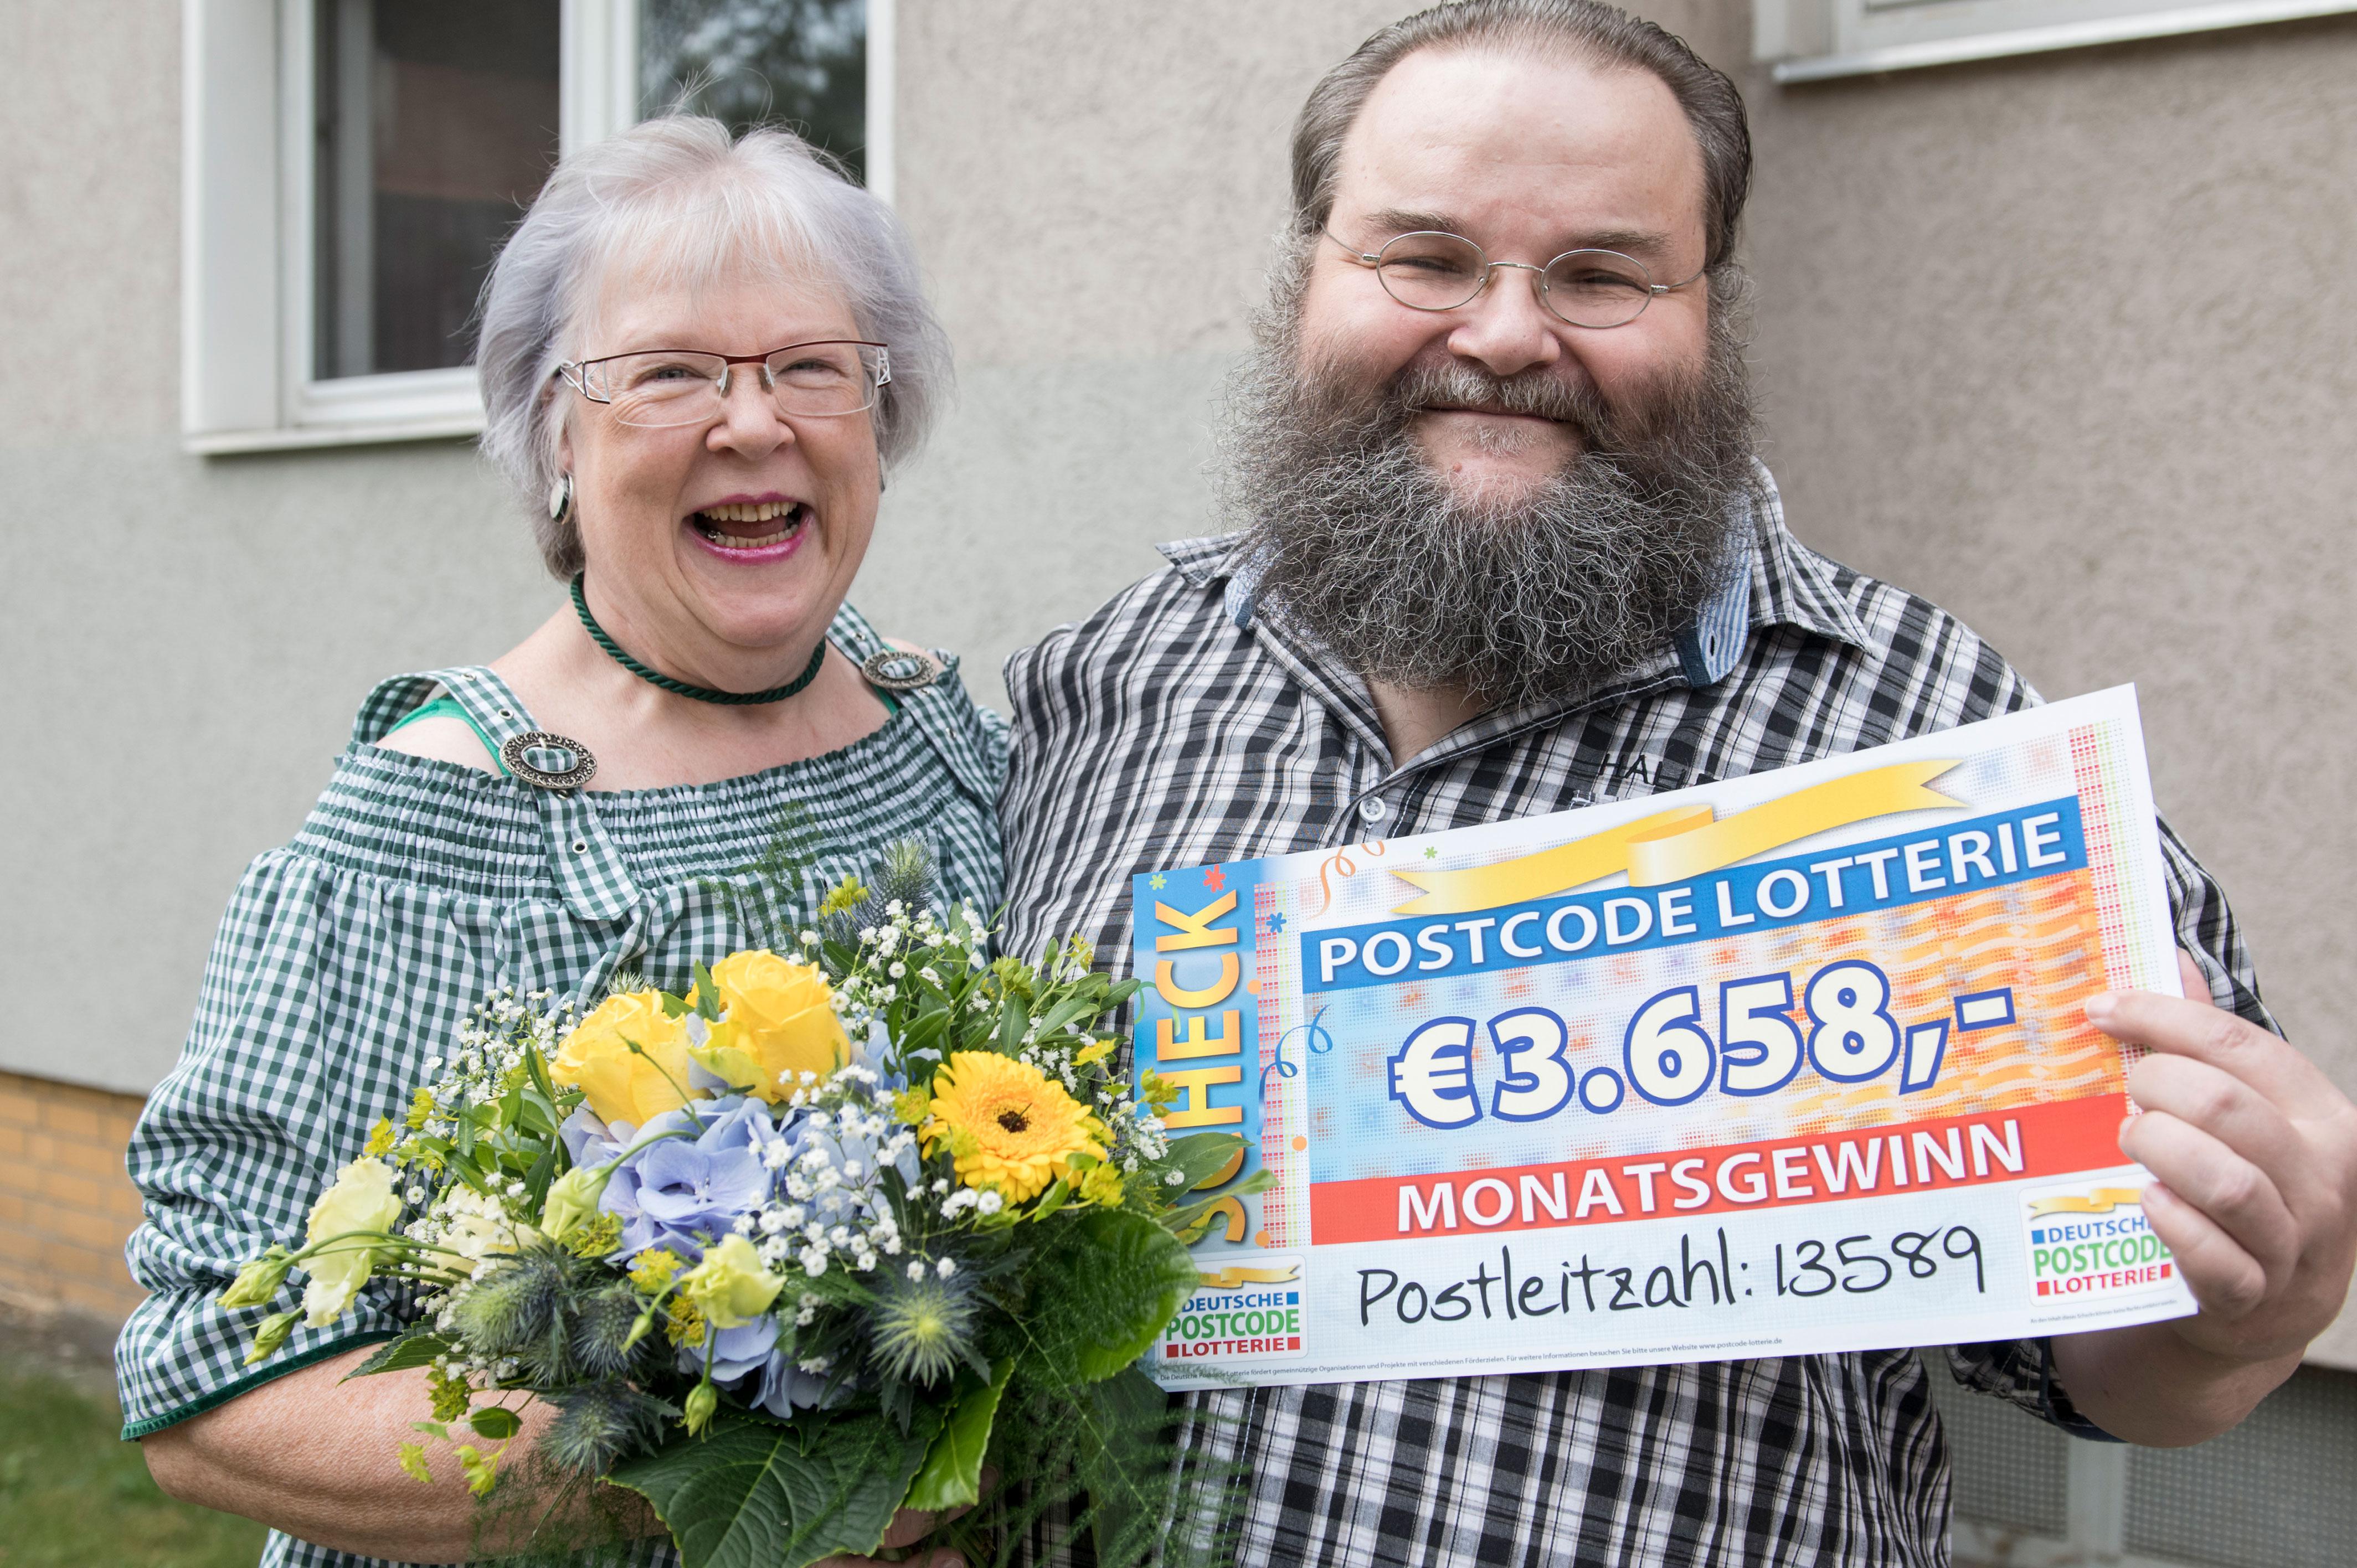 Postcode-Lotterie Seriös